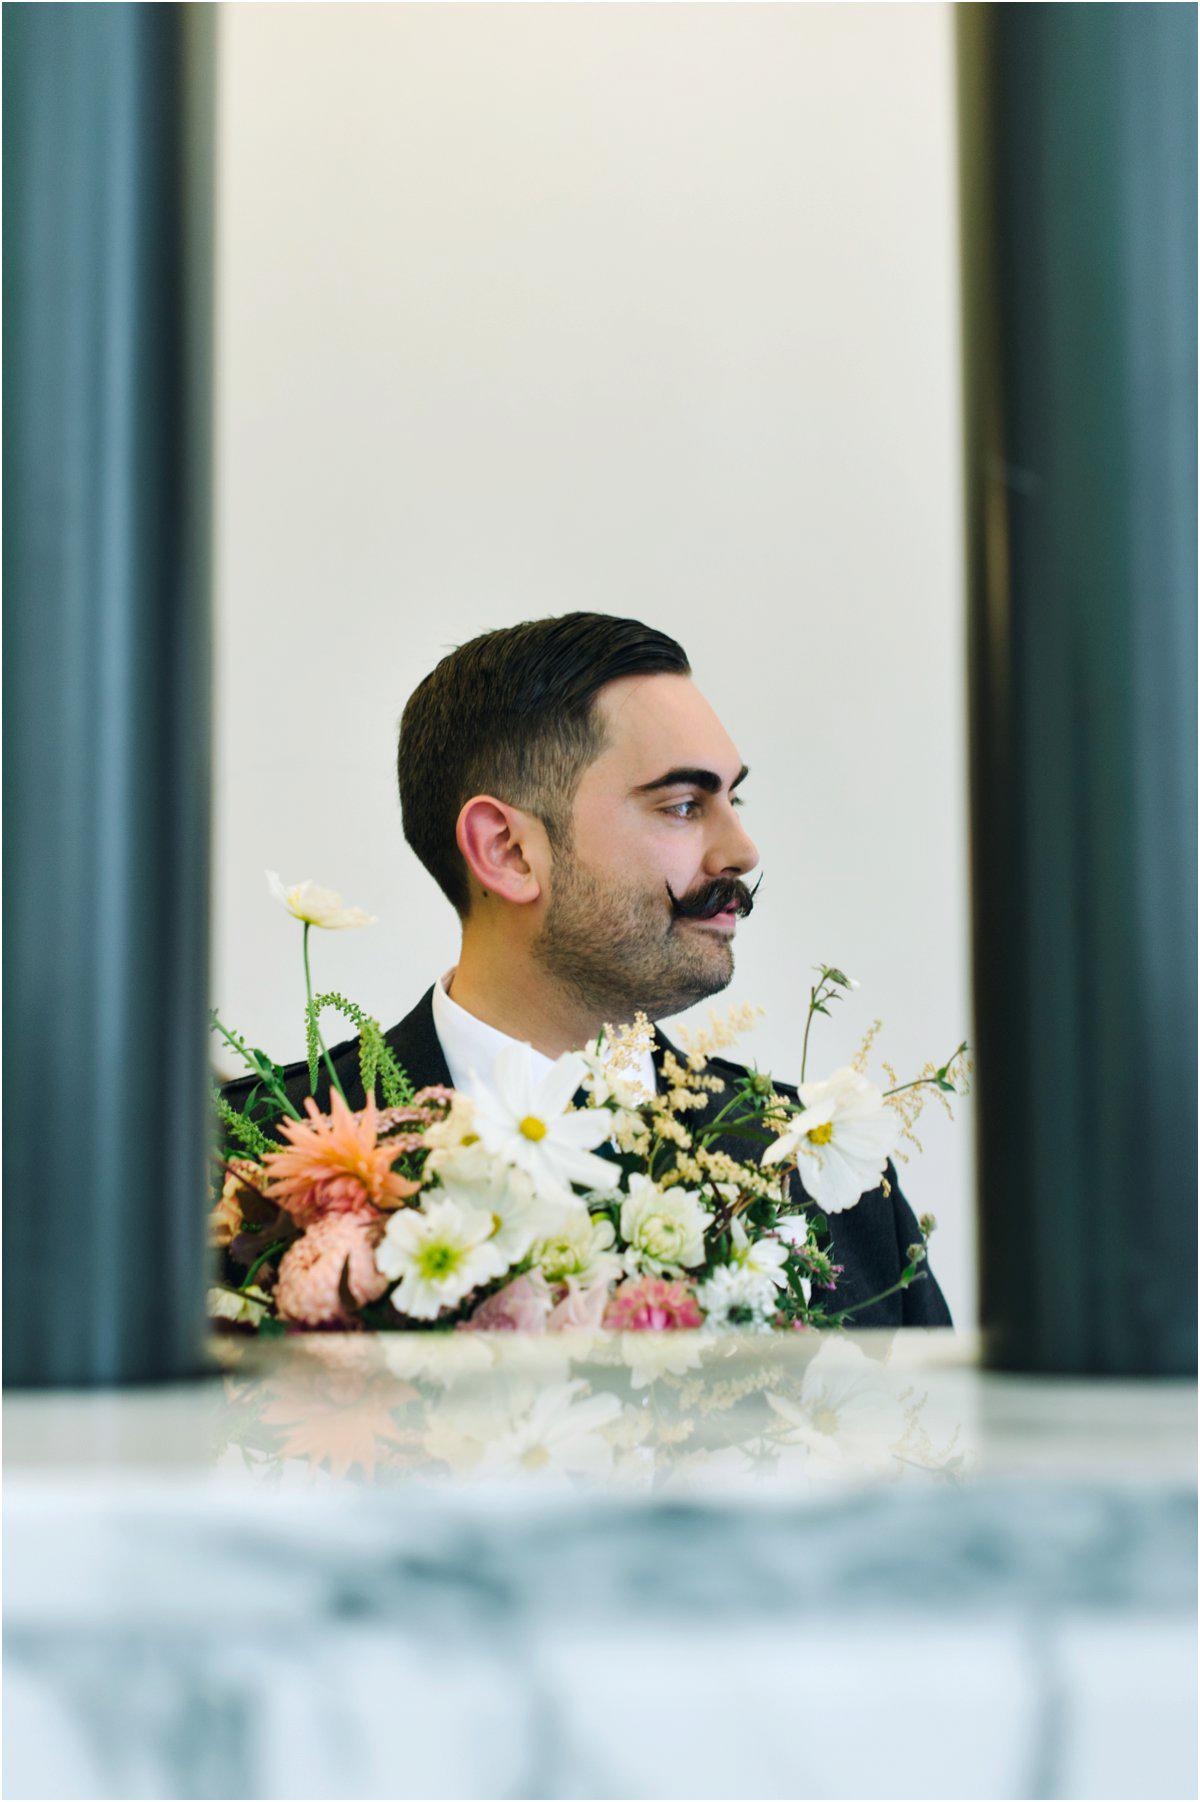 Crofts & Kowalczyk Best Wedding Photography Scotland Blogpost-162.jpg